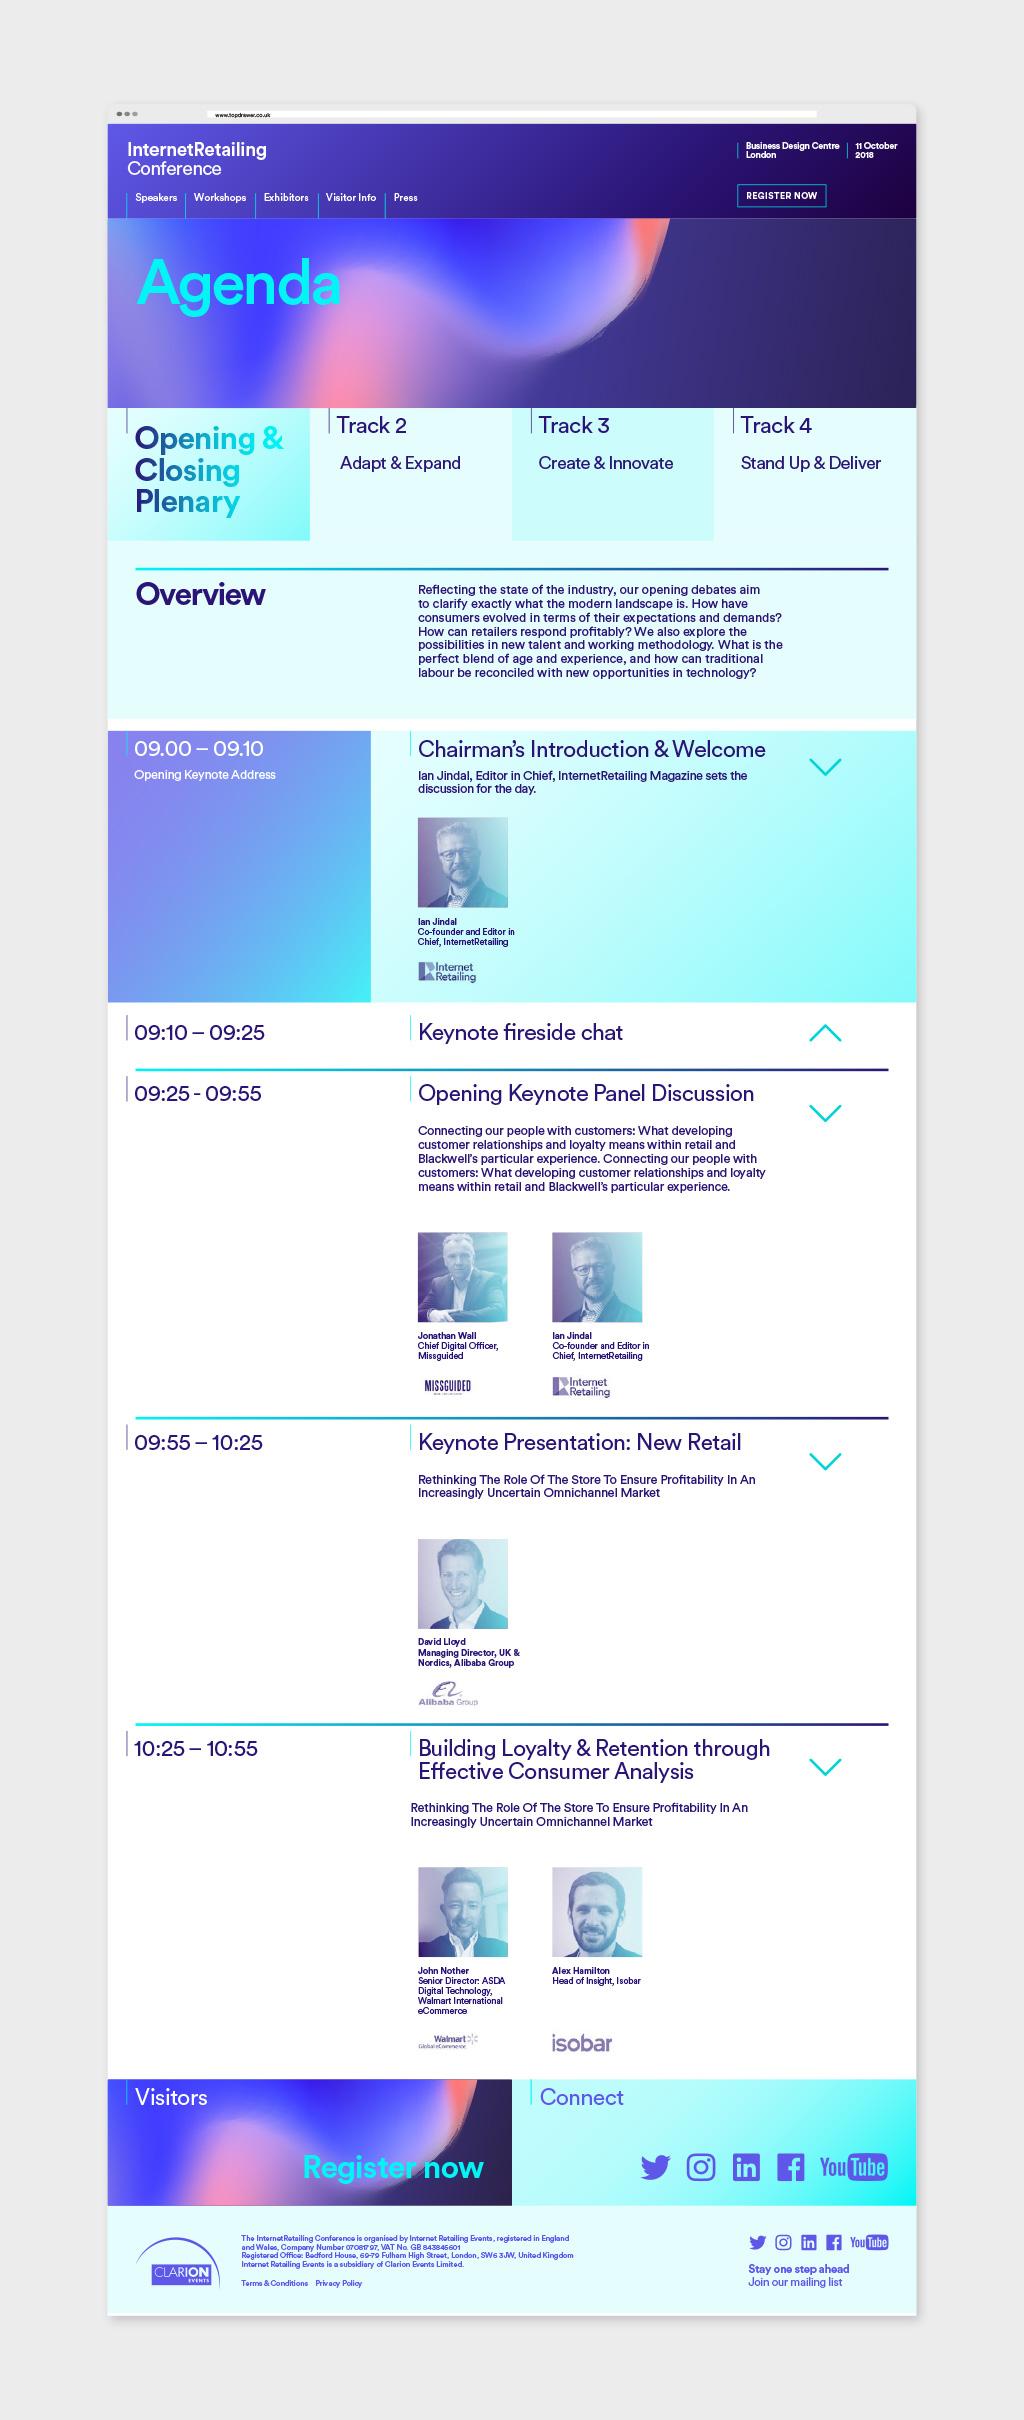 website design of the agenda